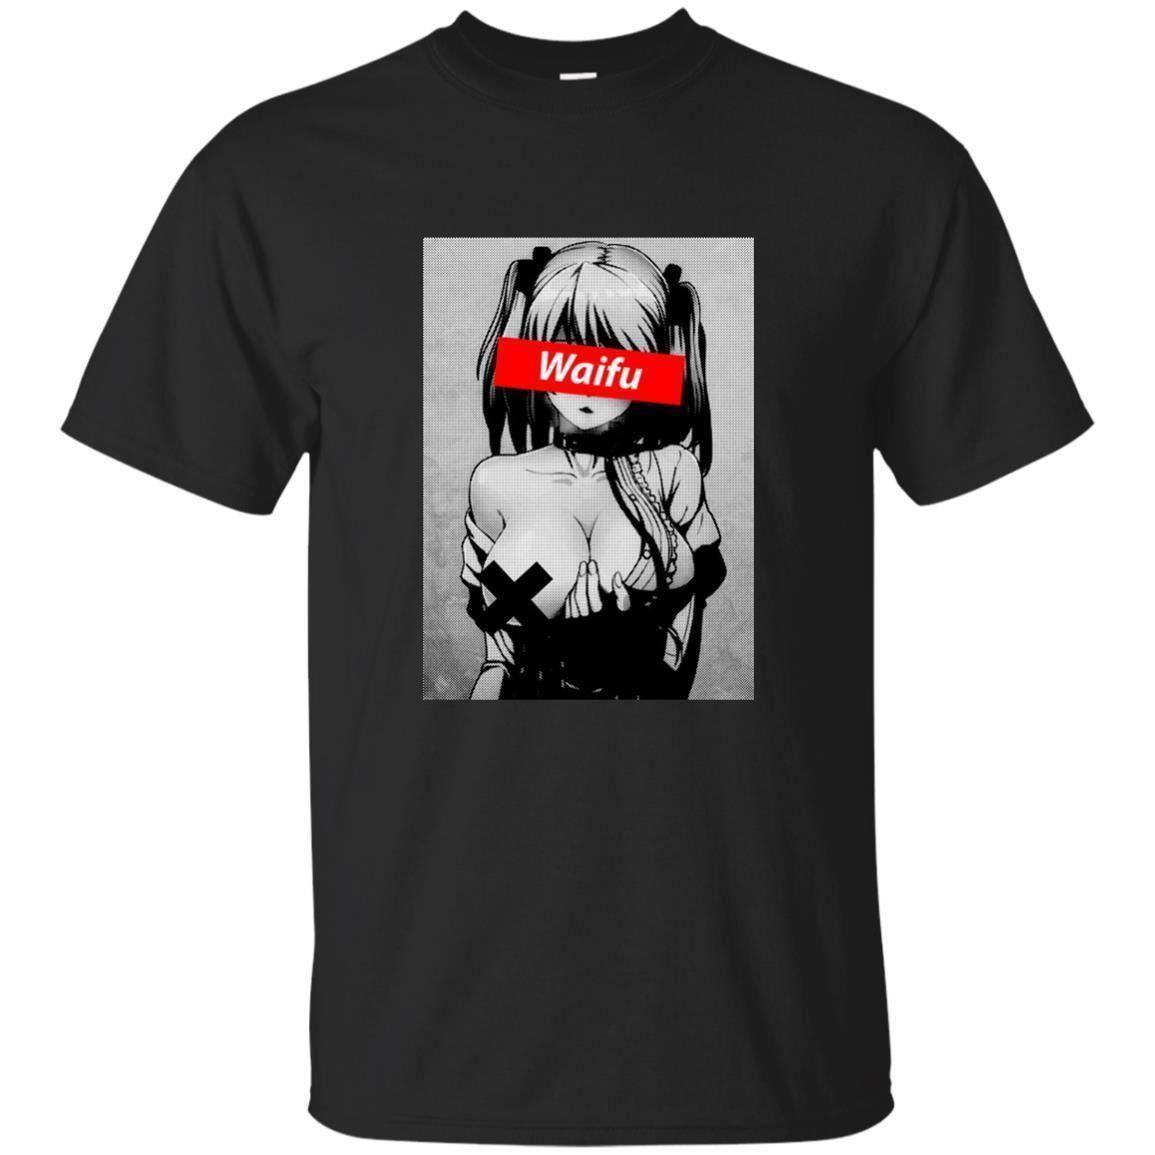 Größe T Hentai Material Männer Shirt Waifu Mädchen Hemd Otaku 5xl Für Lewd Nettes S WEDYH29I